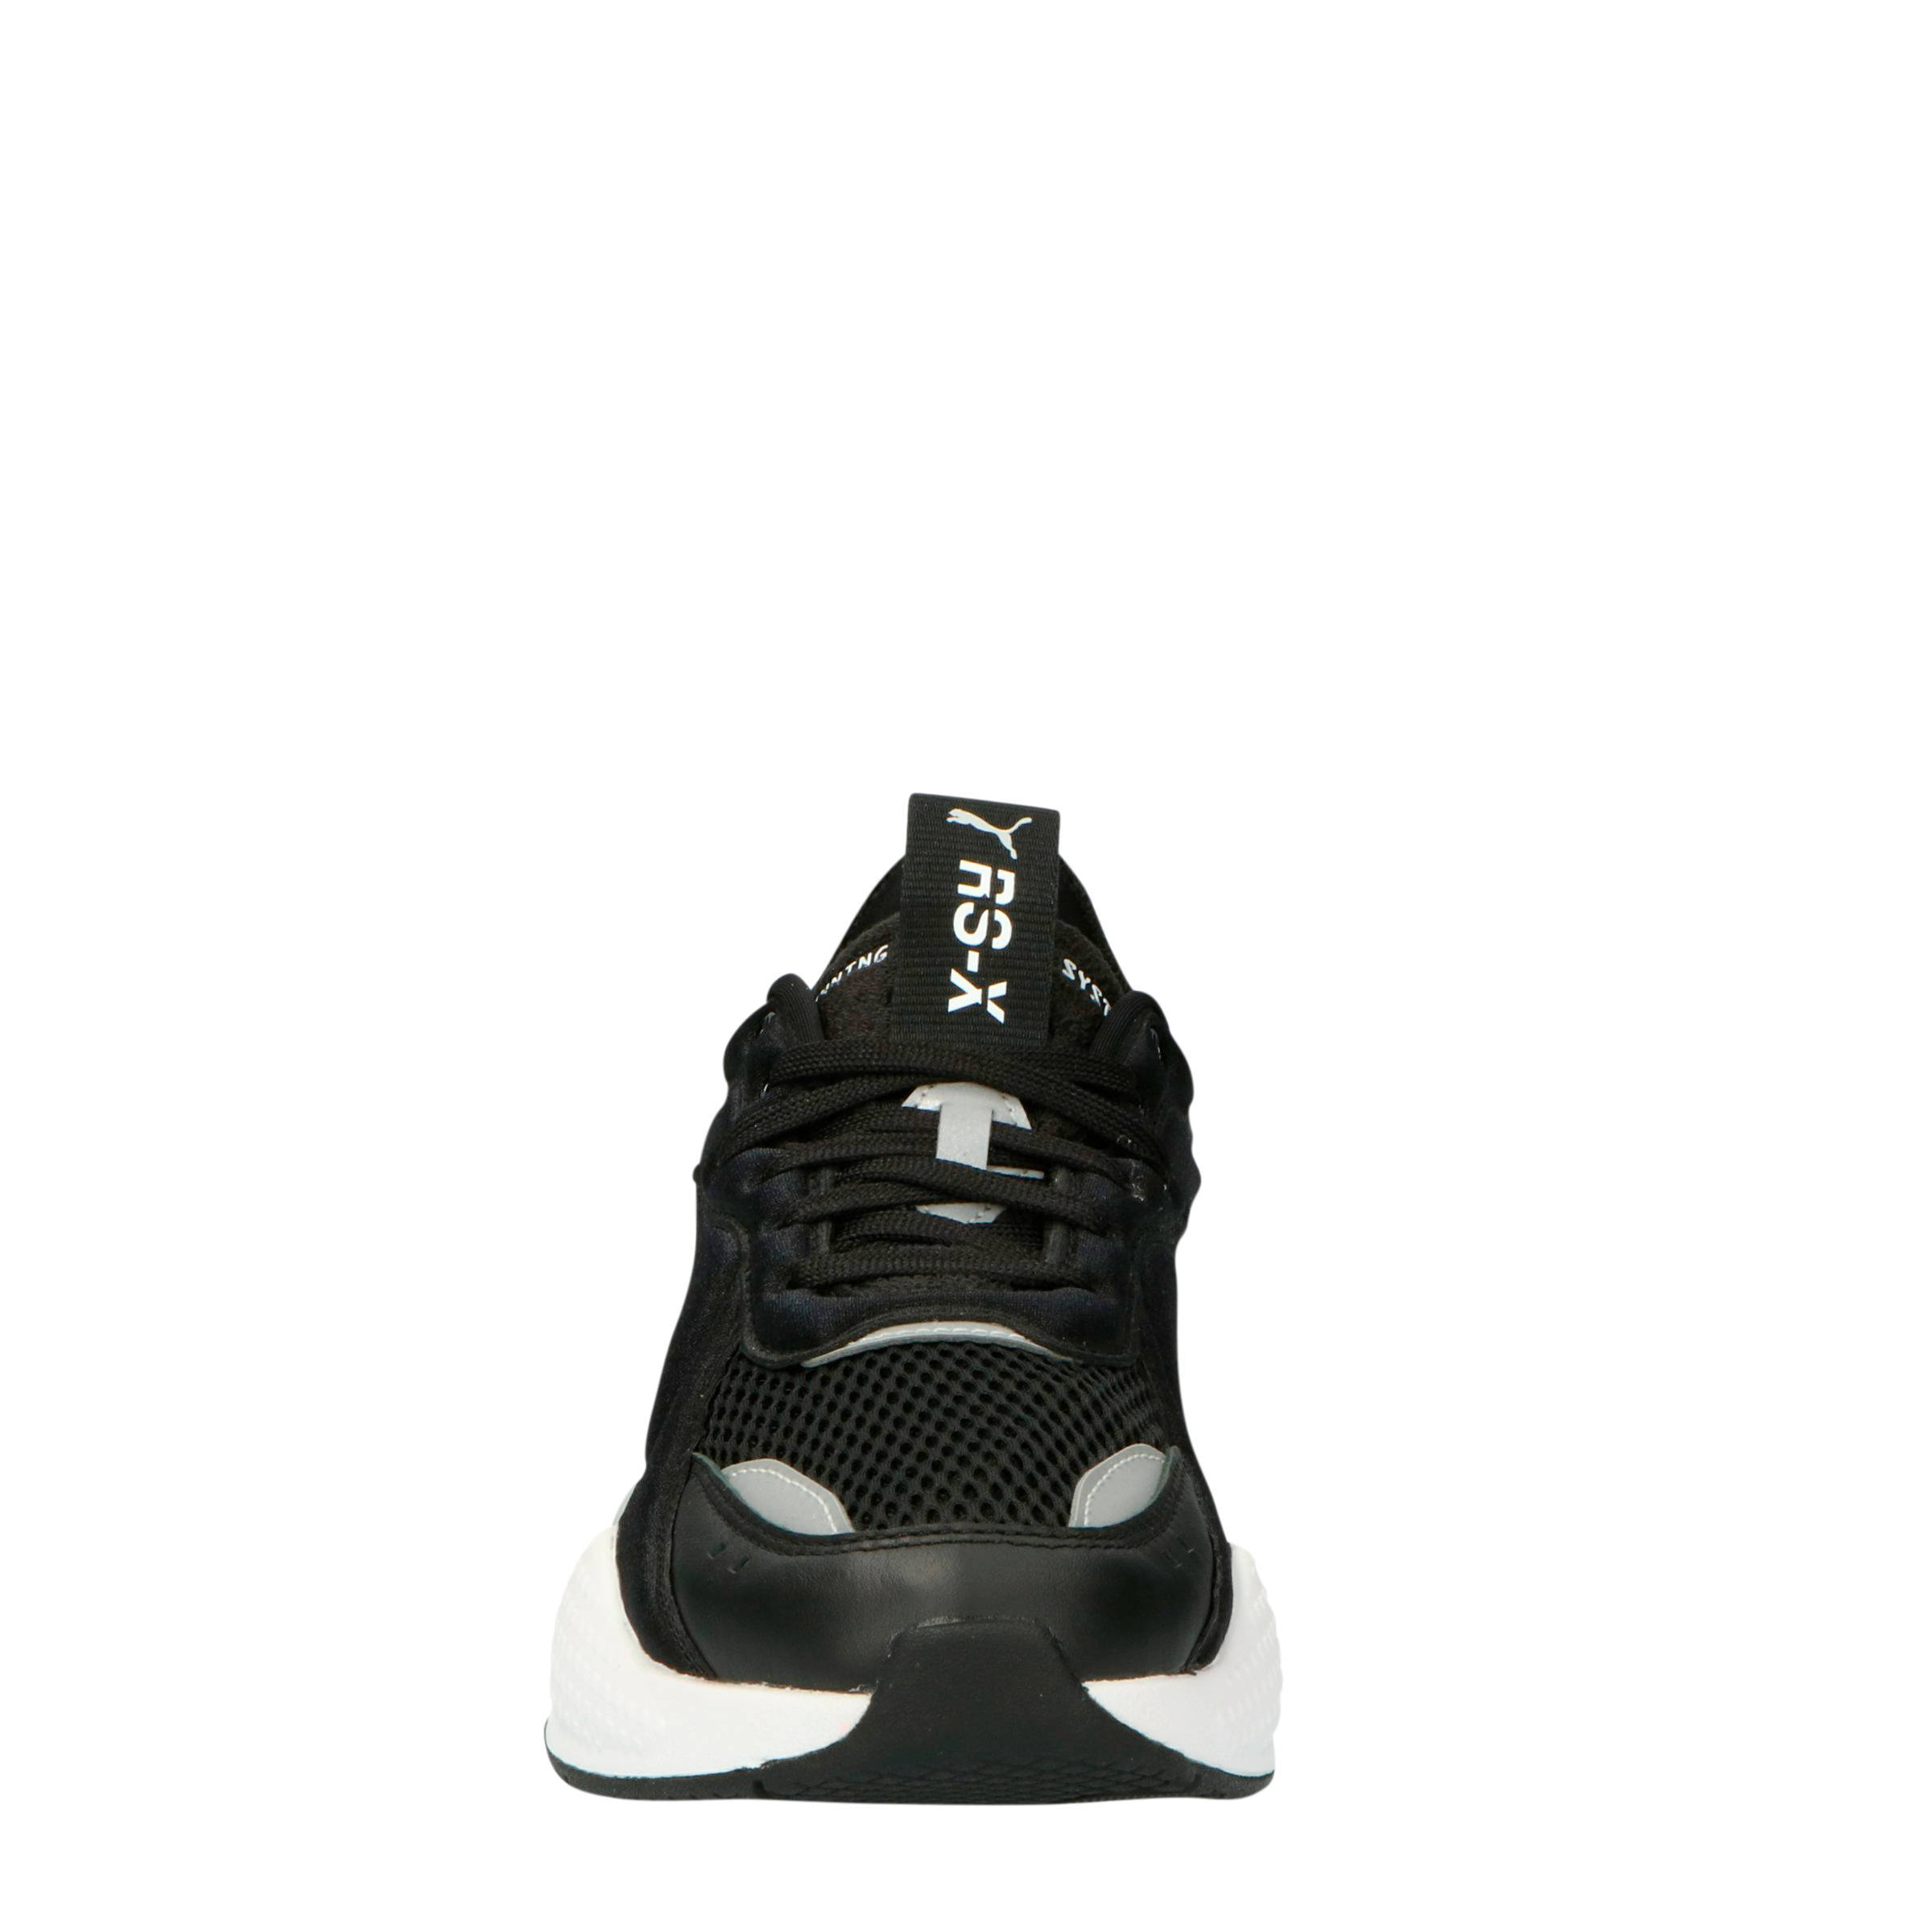 Puma RS X Softcase sneakers zwart | wehkamp